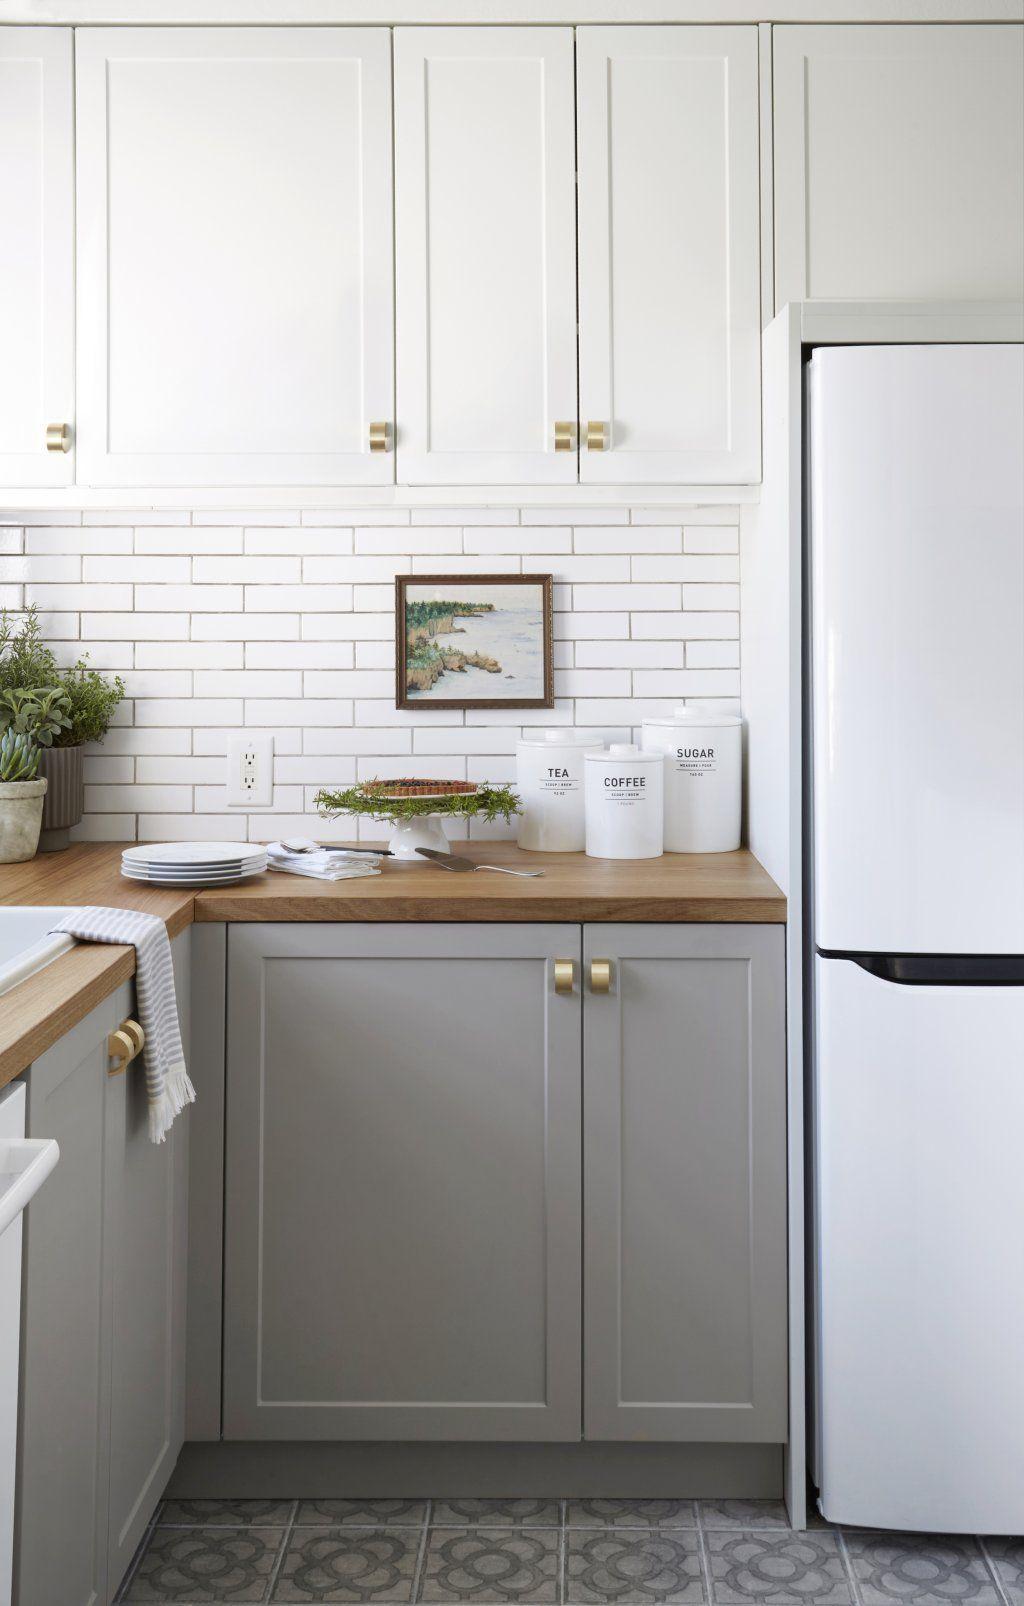 Orlando S Kitchen Reveal Small Kitchen Renovations Rental